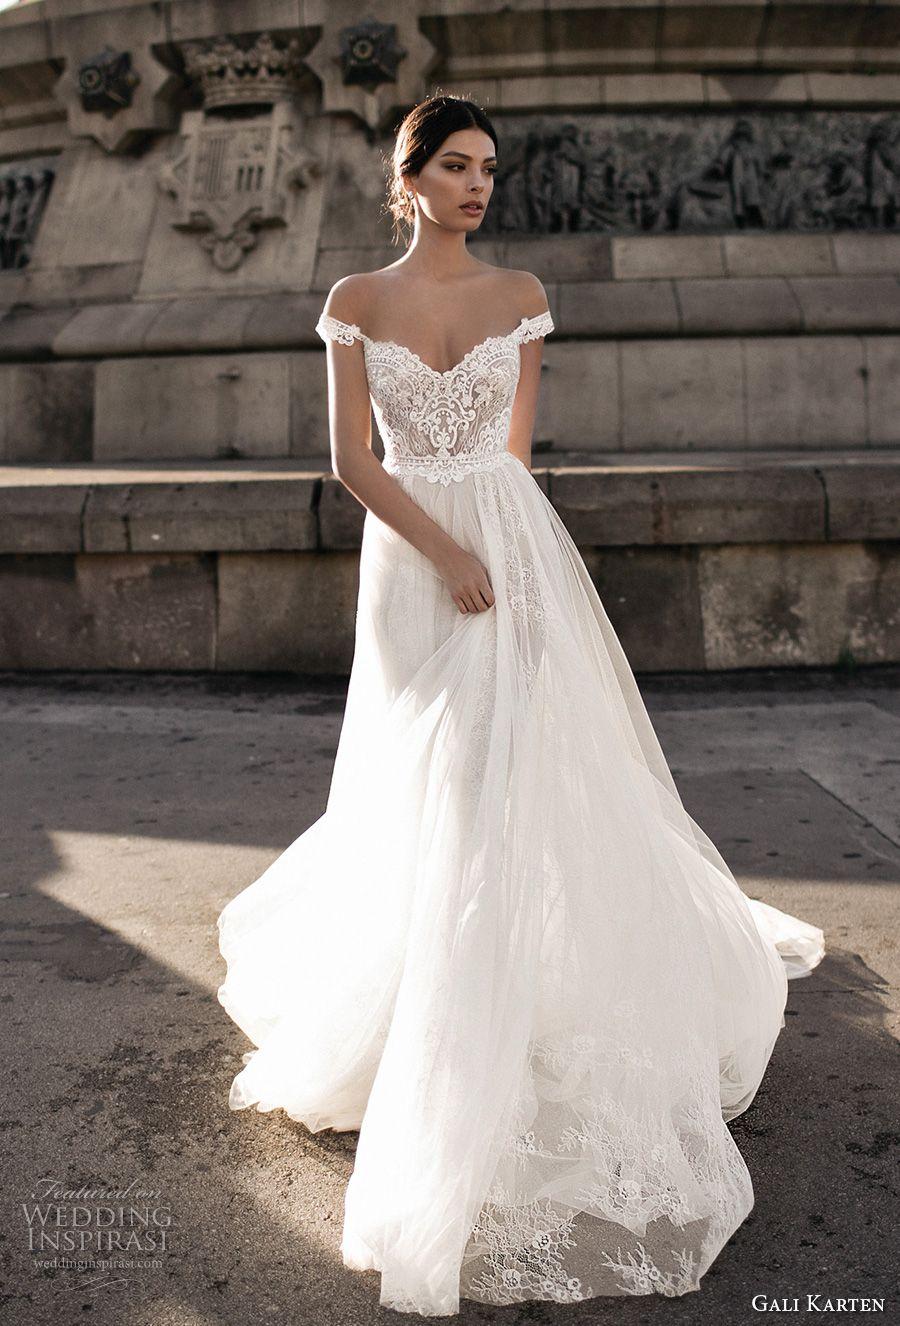 Gali karten wedding dresses u ucbarcelonaud bridal collection